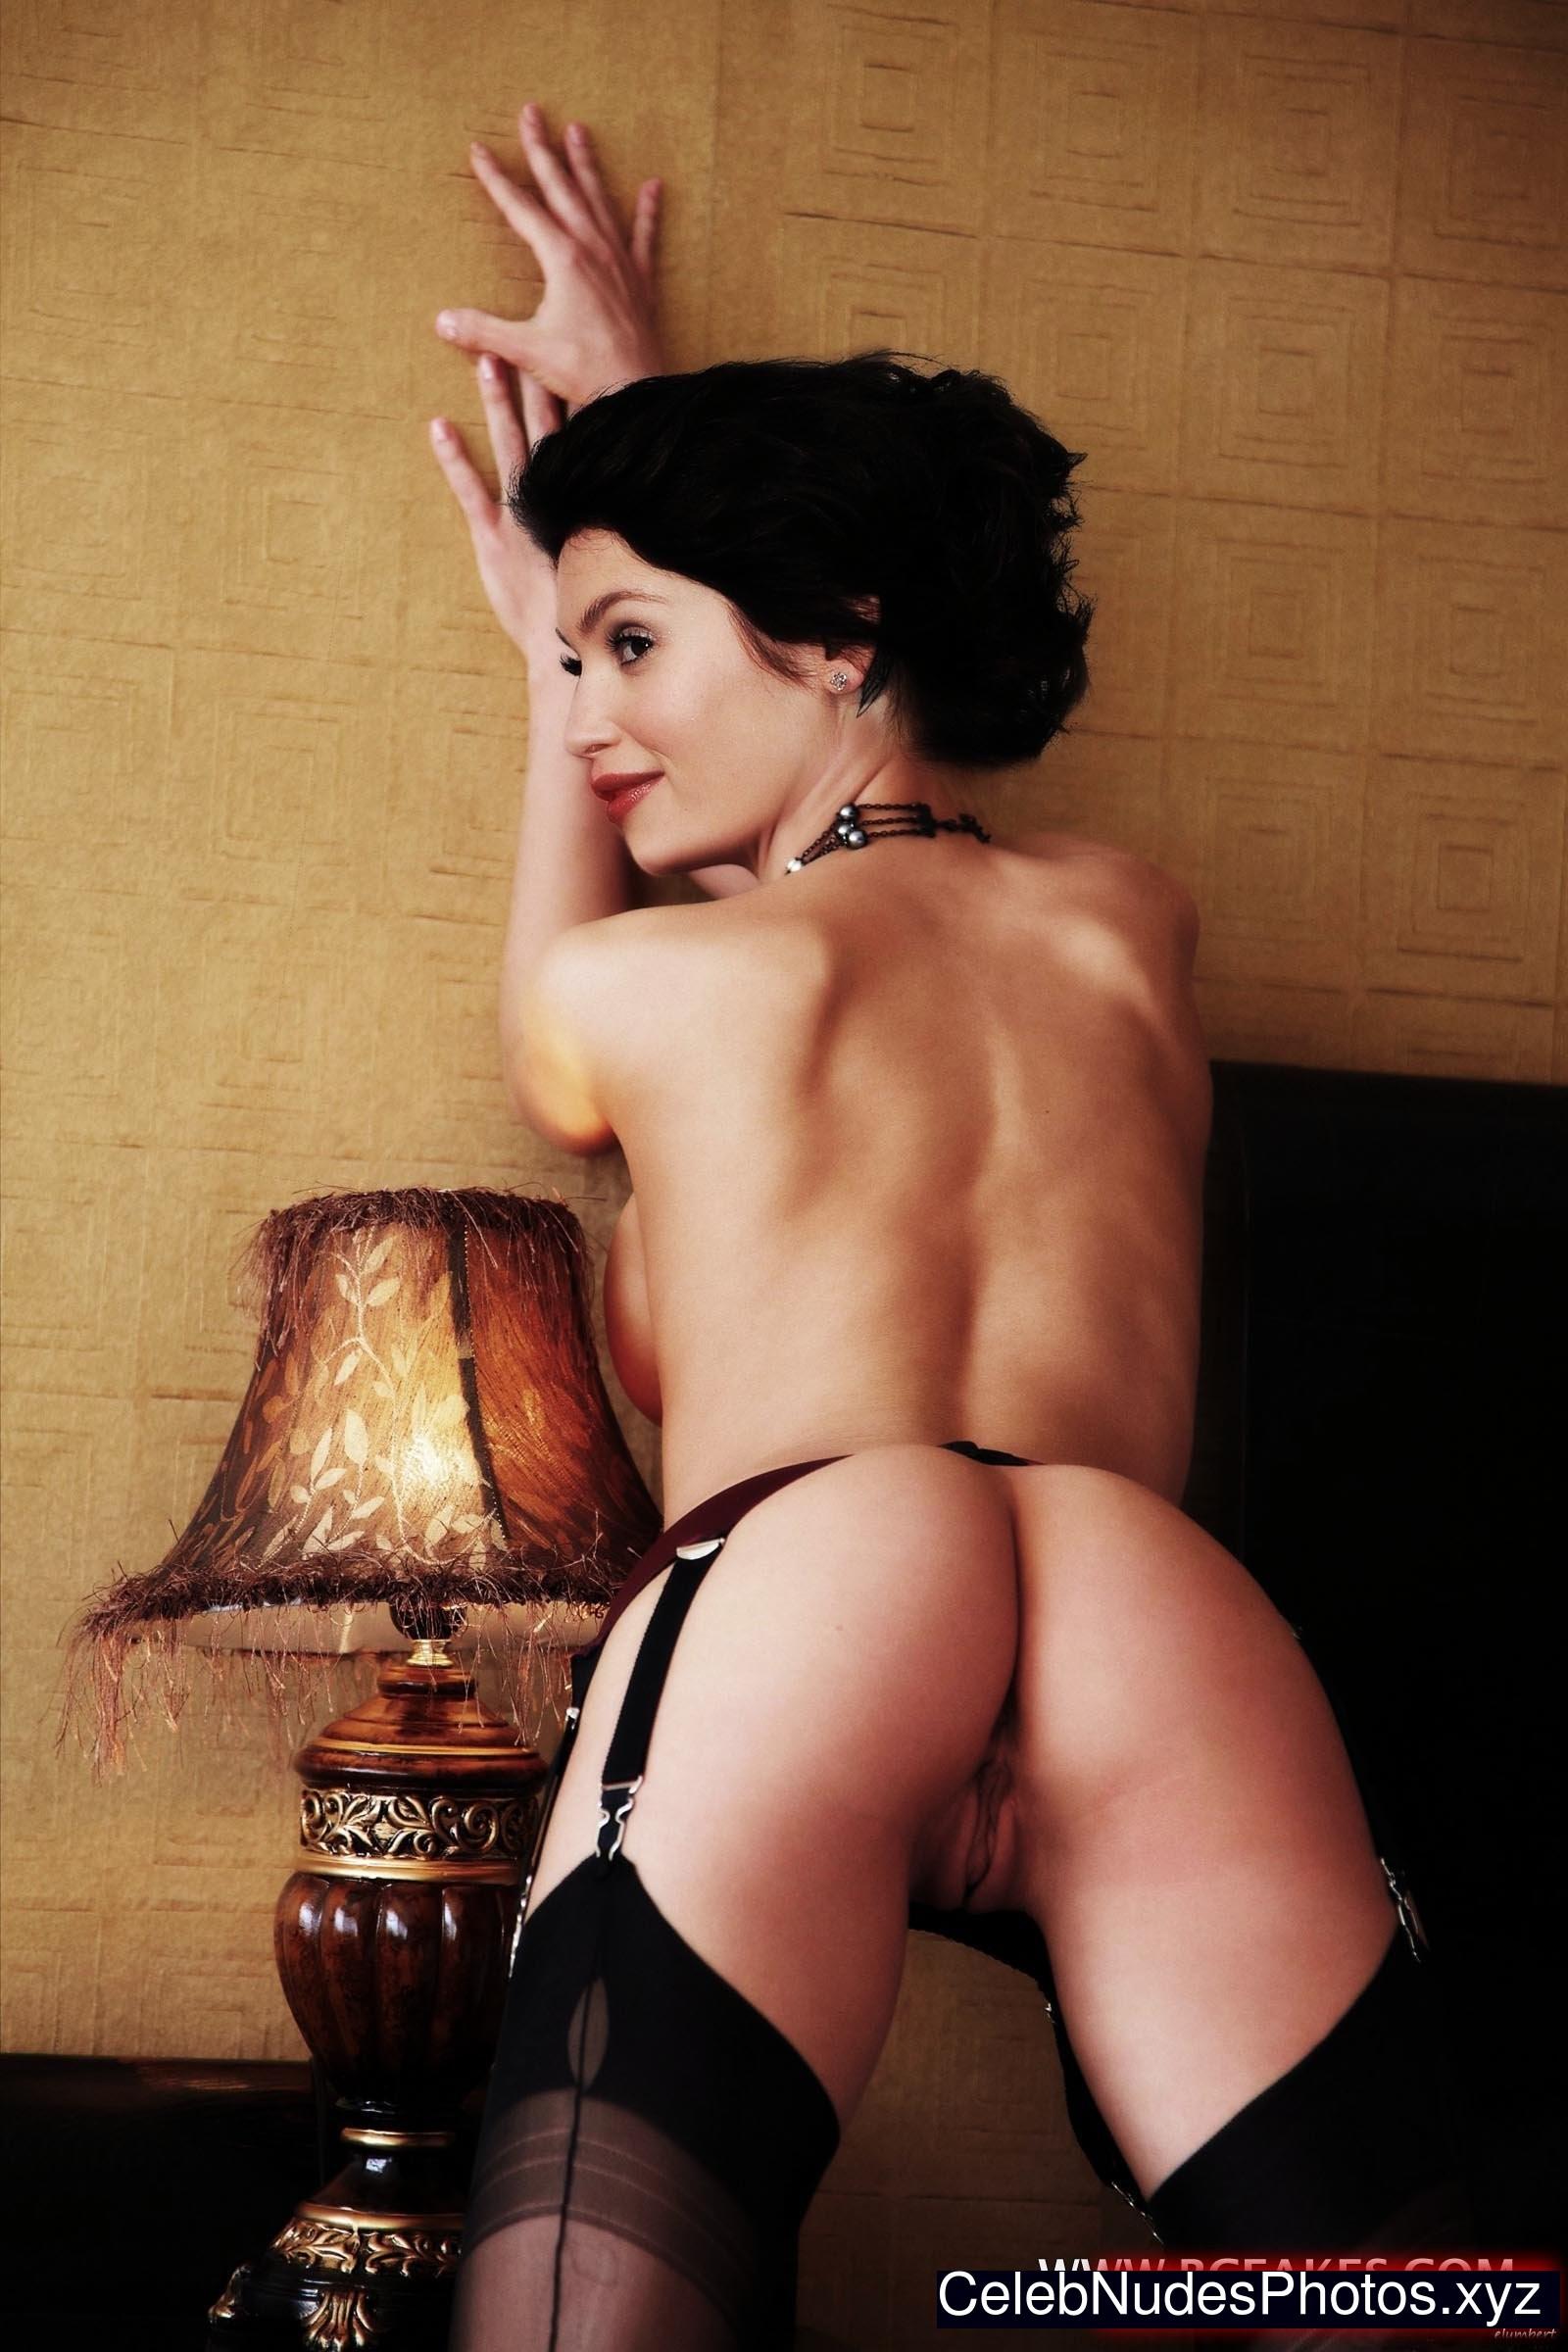 Gemma arterton sexy pictures